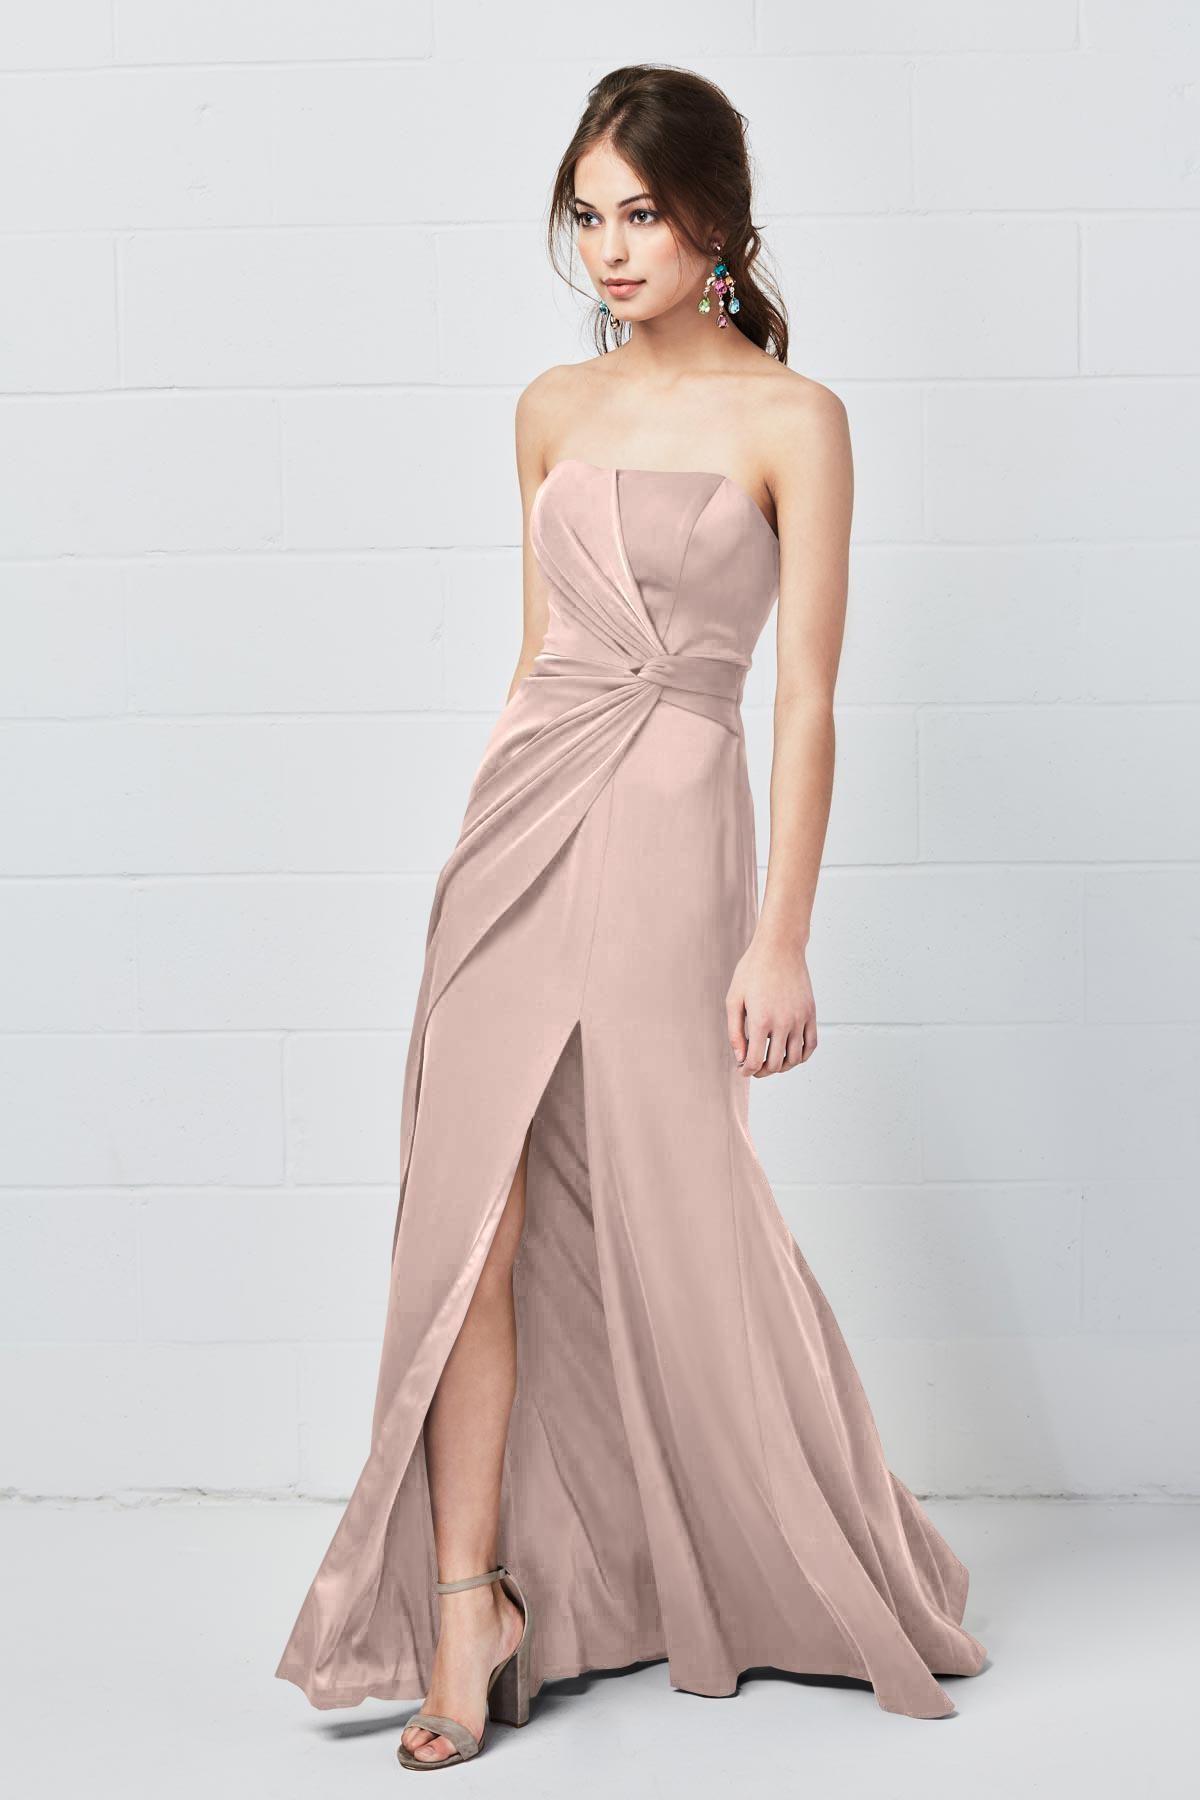 Rayden Flared Bridesmaid Dresses Watters Bridesmaid Dresses Watters Bridesmaid